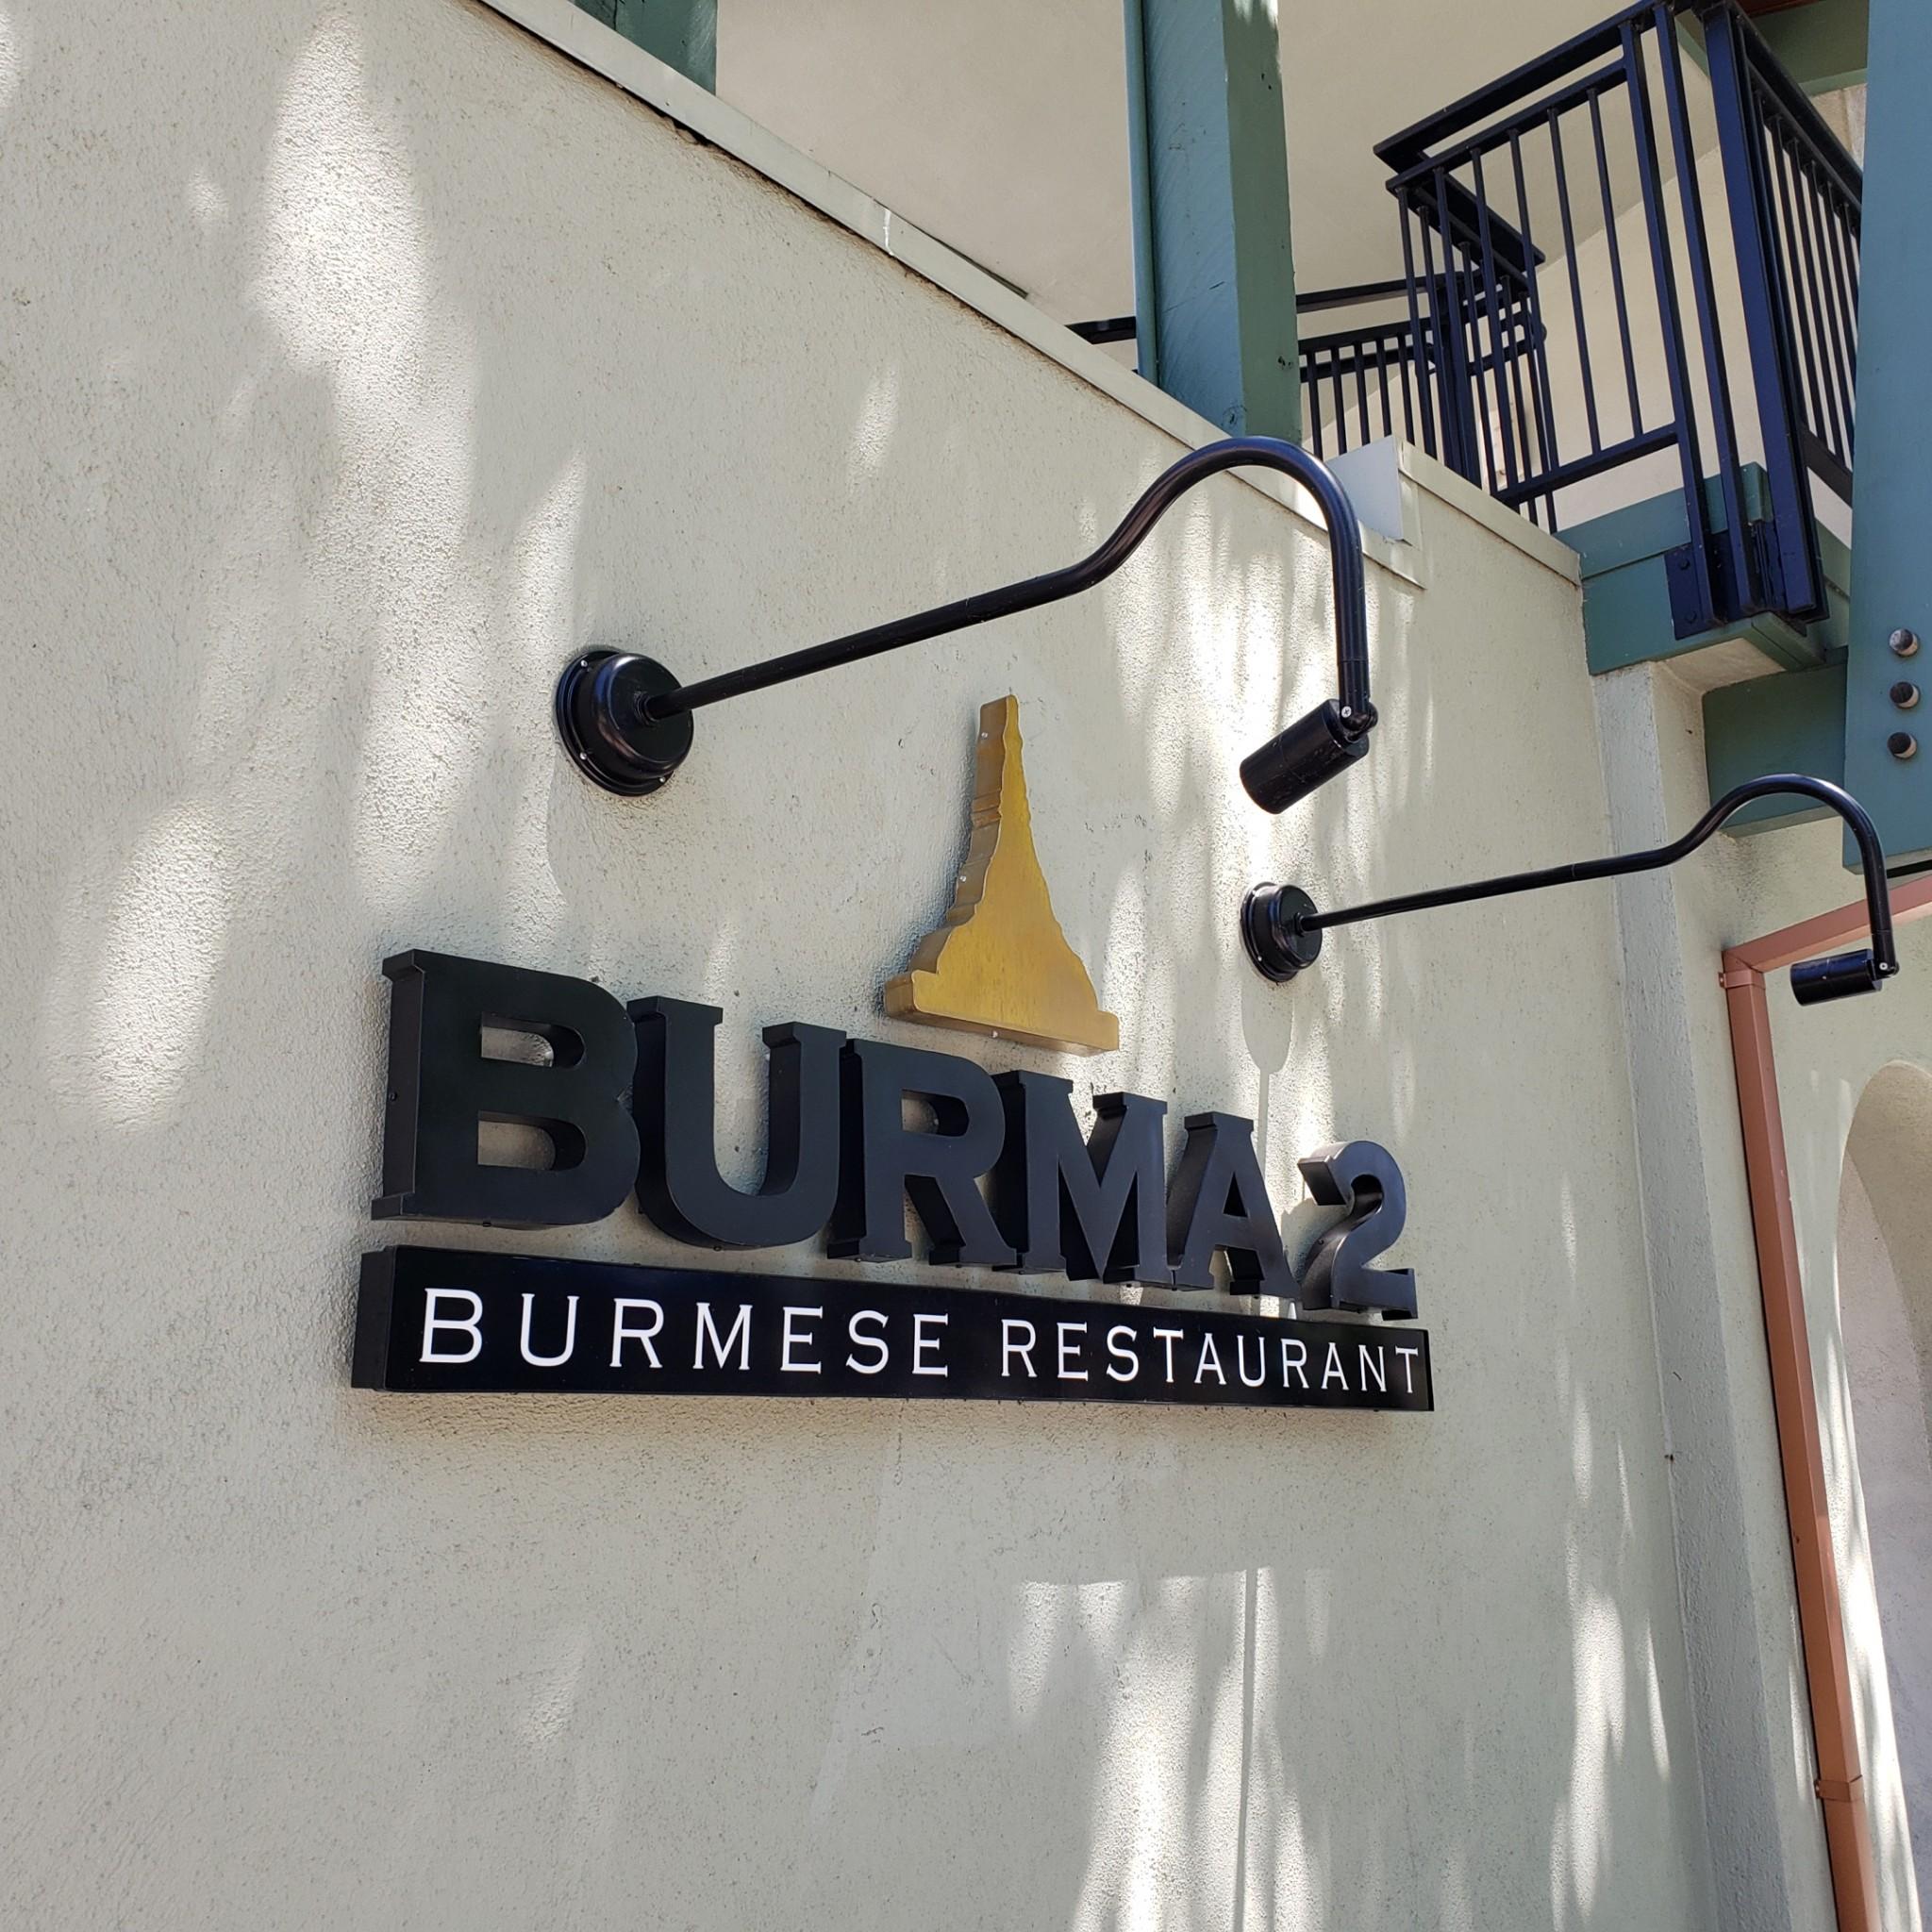 Burma 2 front sign.JPG